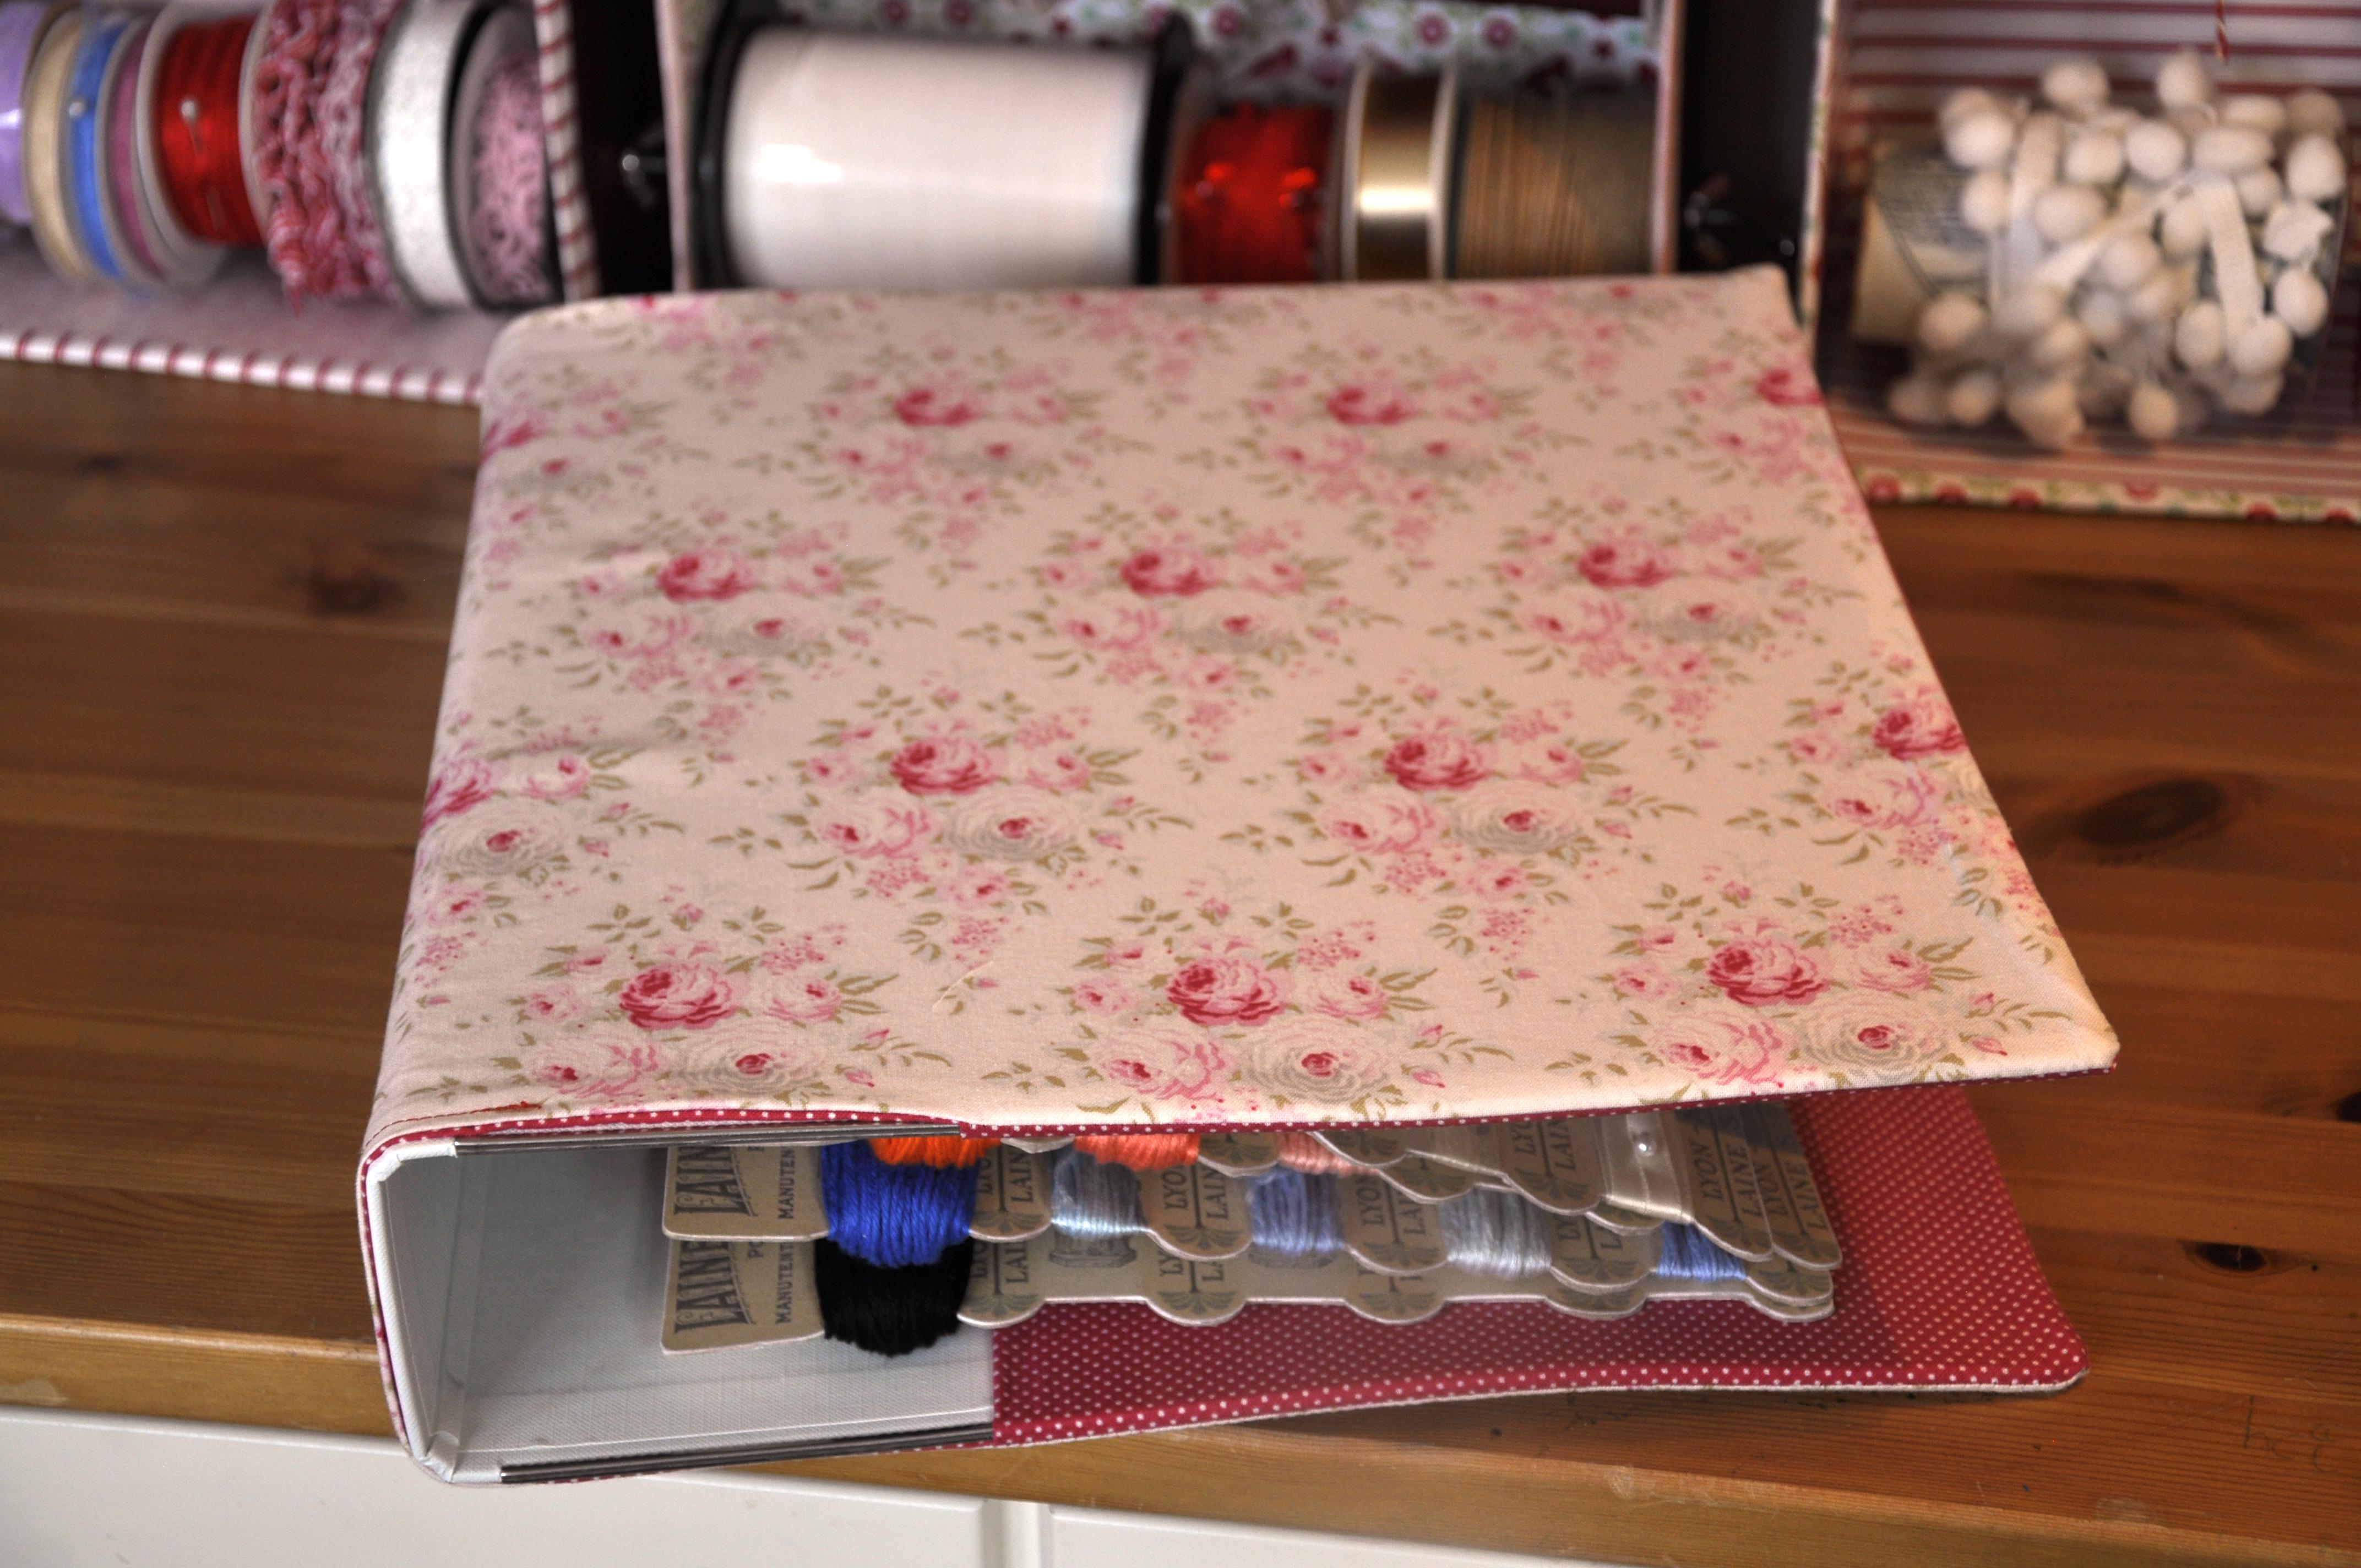 Sewing Printables Free Vintage The Vintage Sewing Room Project Part 3 Of 3 Free Printables